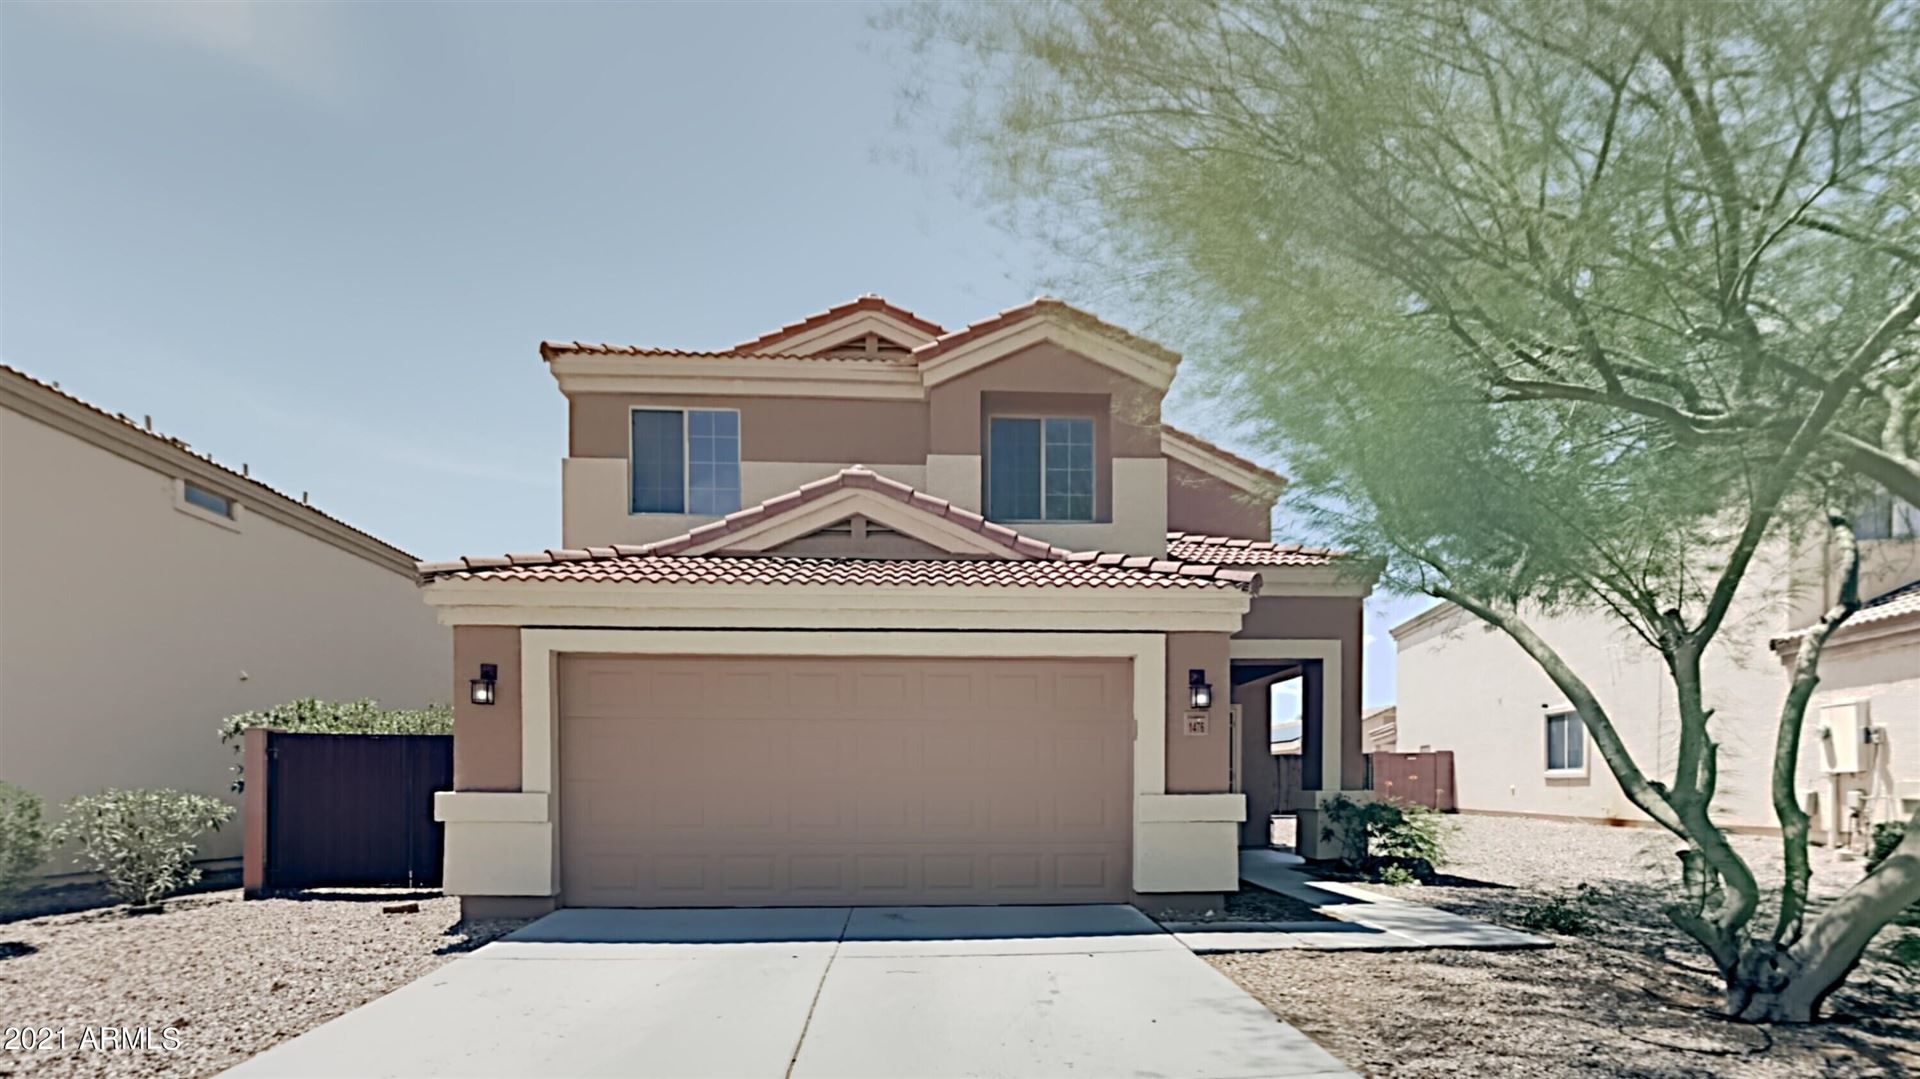 Photo of 1476 S 218TH Lane, Buckeye, AZ 85326 (MLS # 6268972)